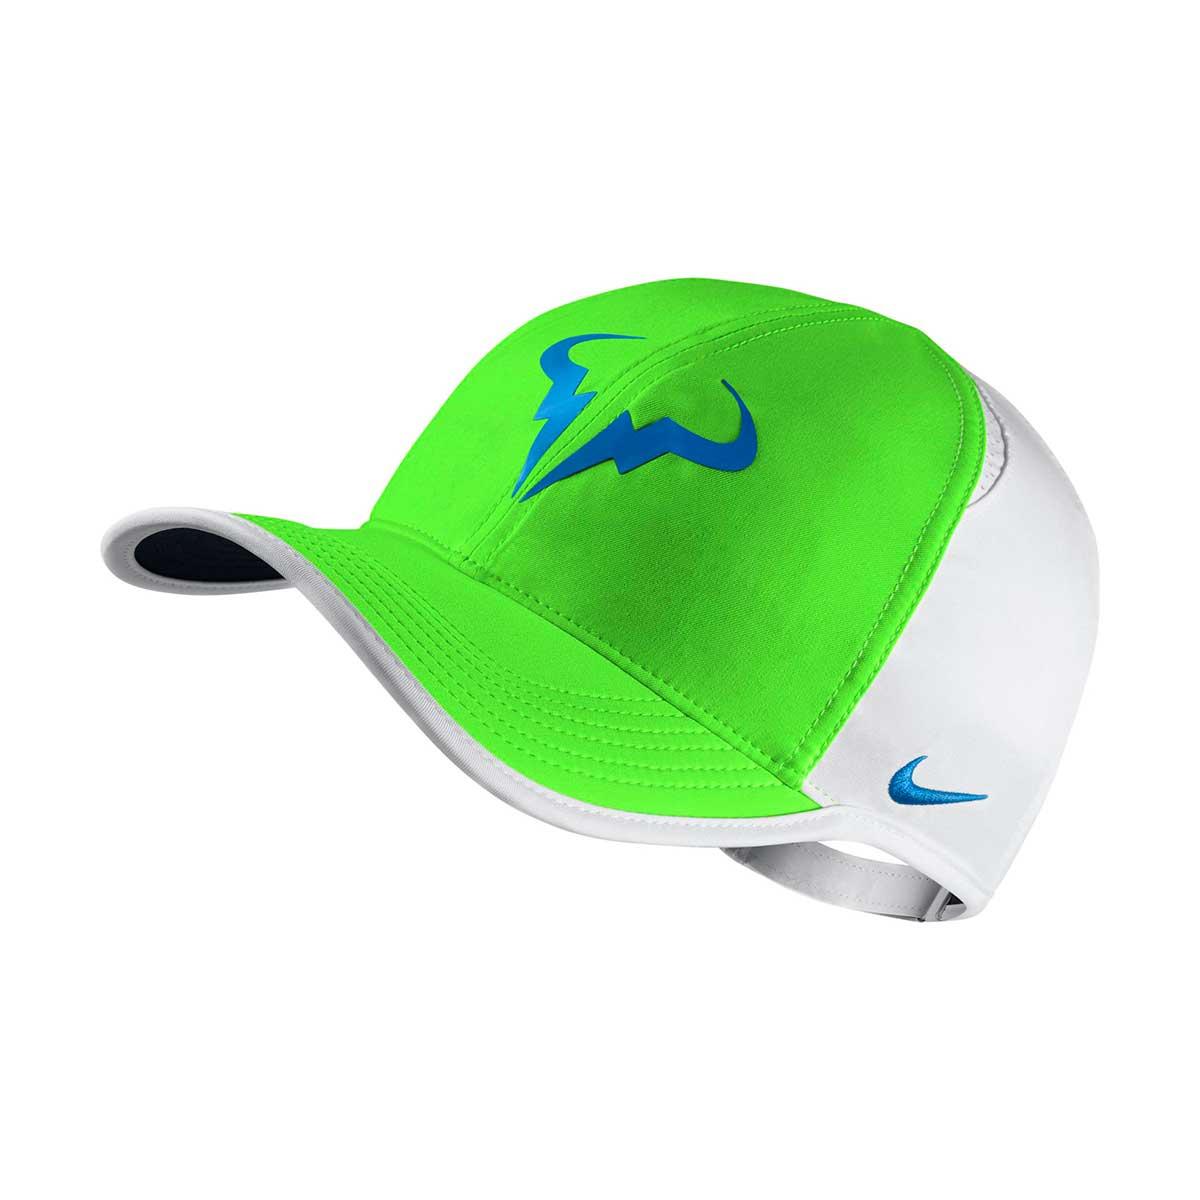 76675f45ab5d1 Buy Nike Rafa Cap Online India